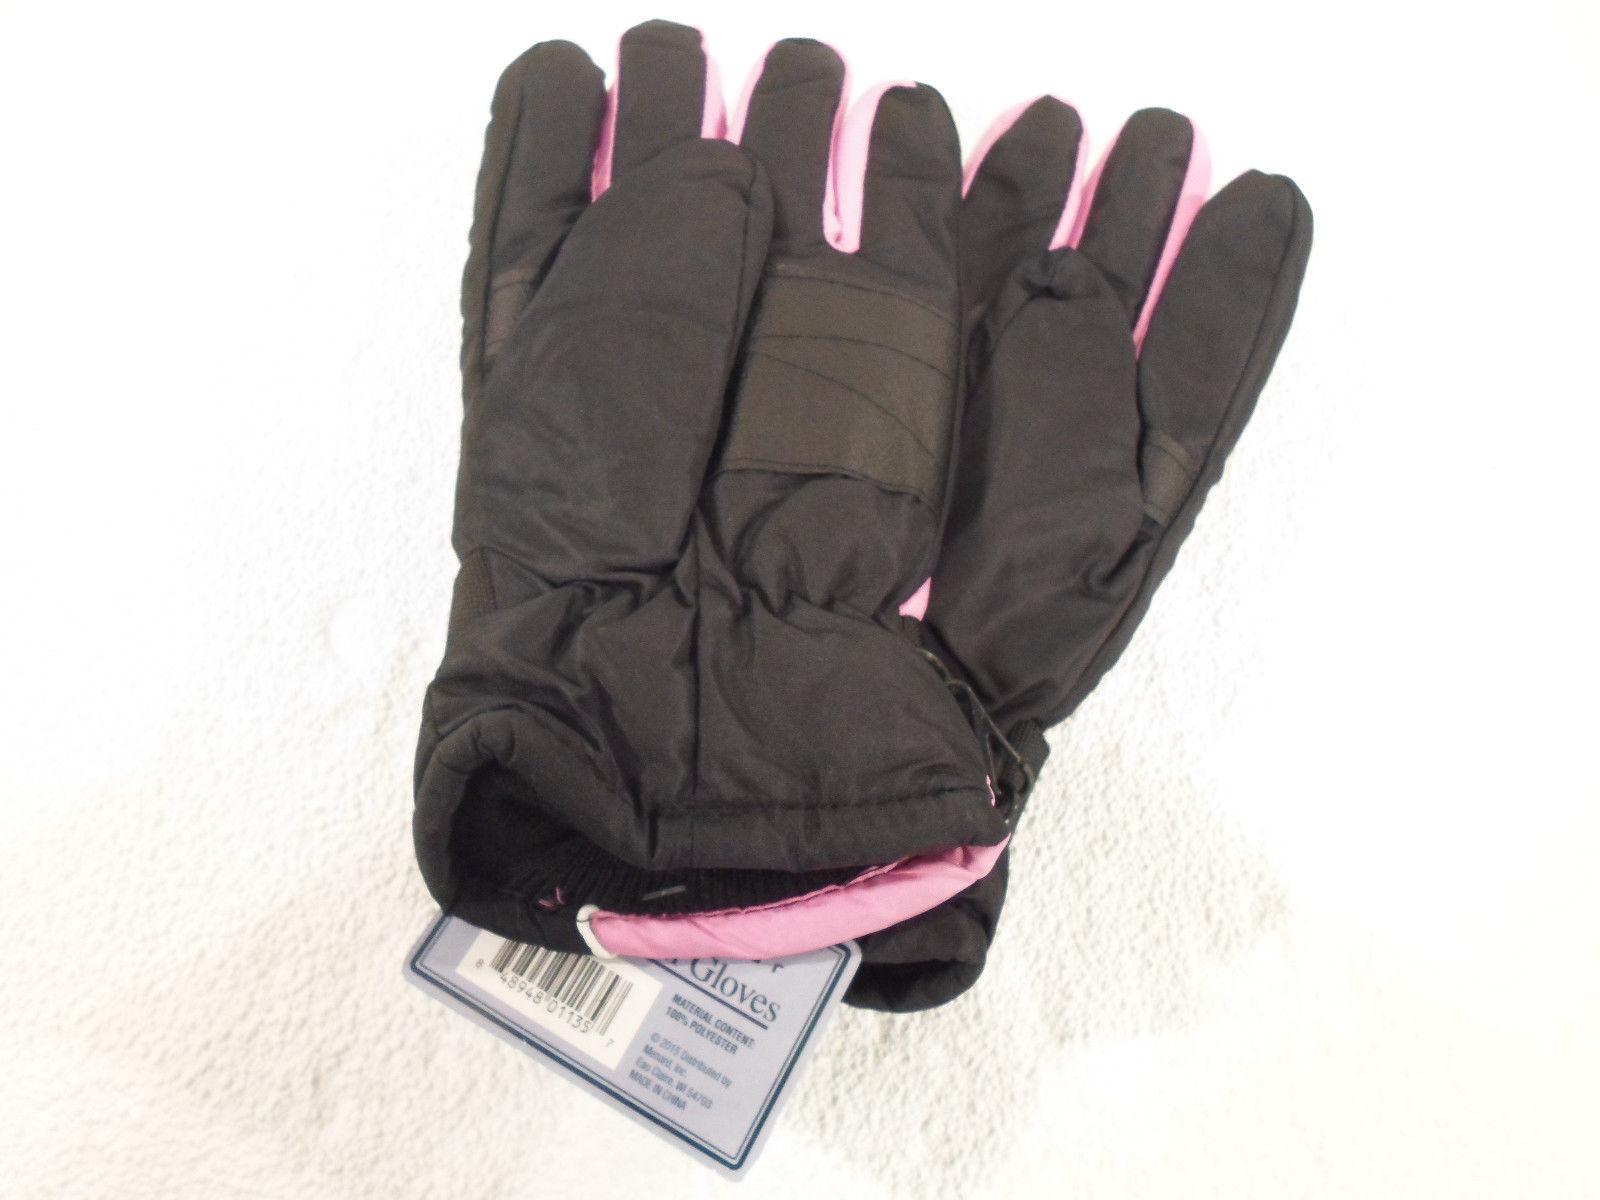 Rugged Wear Men S Ski Gloves - Carpet Vidalondon